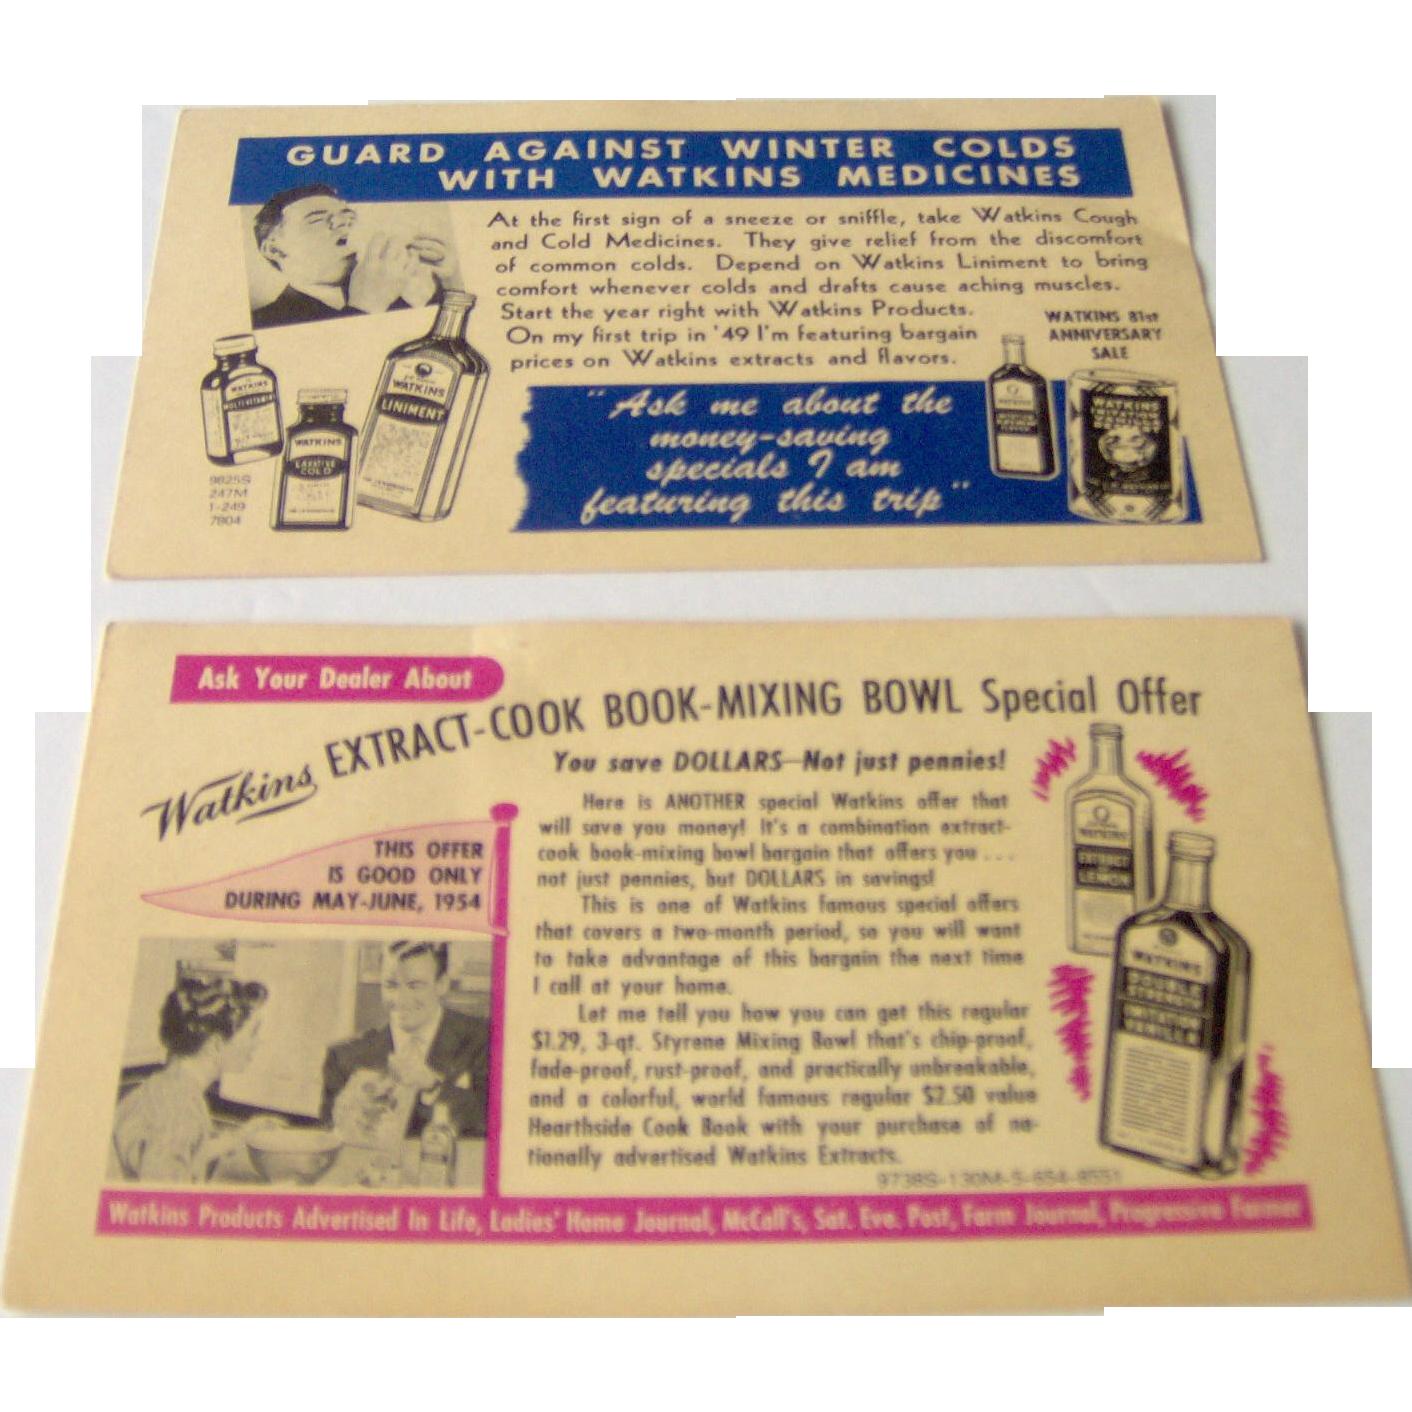 Vintage Watkins Salesman Postcards for assorted Watkins products